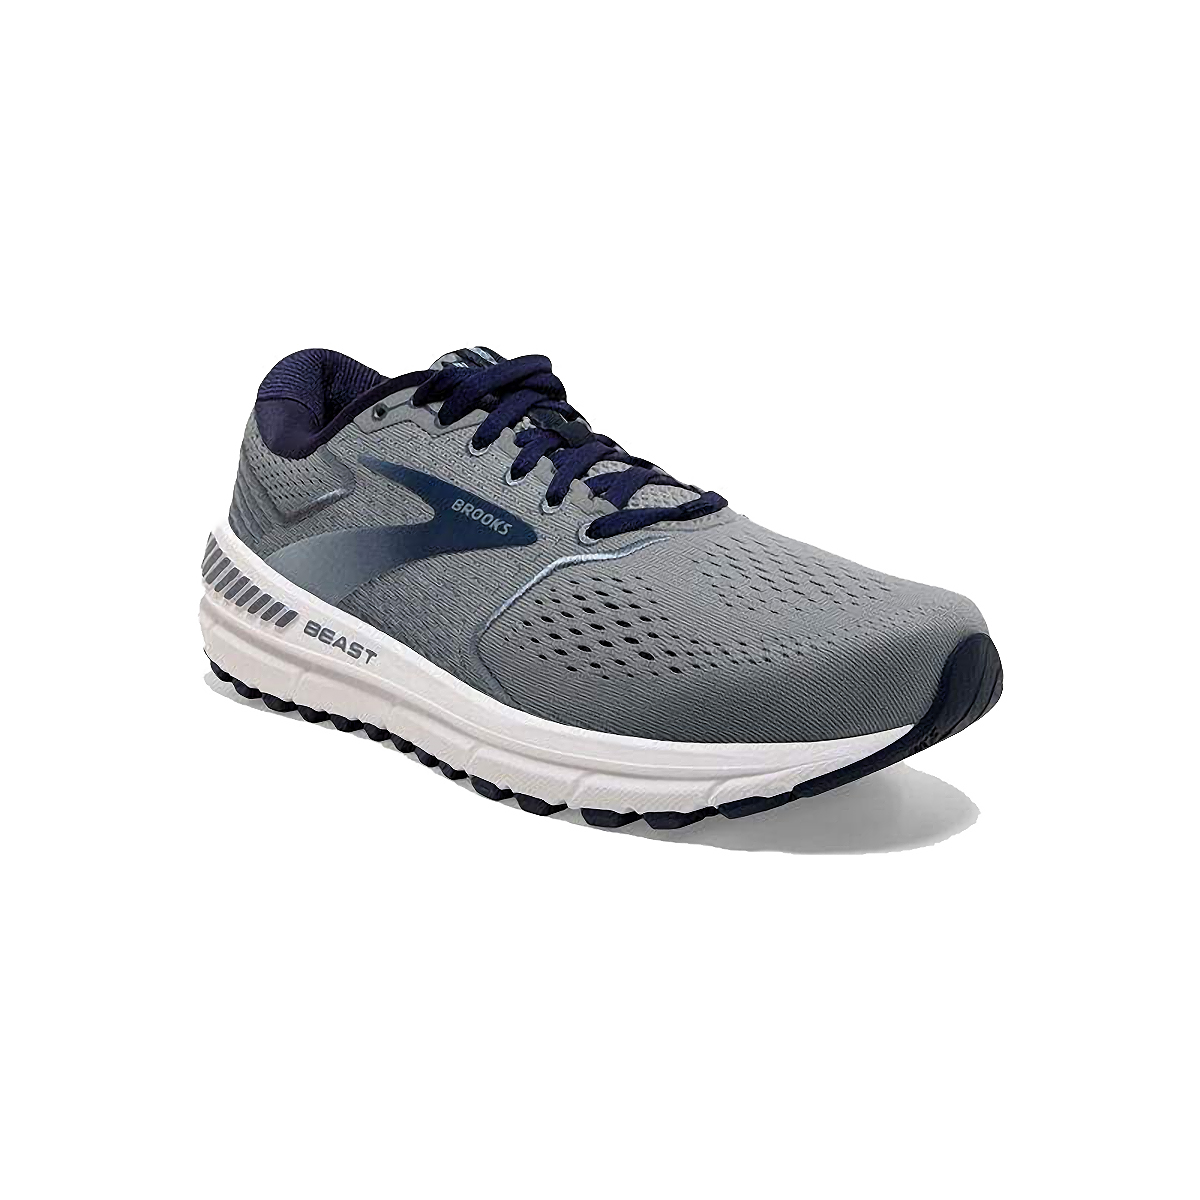 Men's Brooks Beast 20 Running Shoe - Color: Blue/Grey/Peacoat (Regular Width) - Size: 8, Blue/Grey/Peacoat, large, image 4